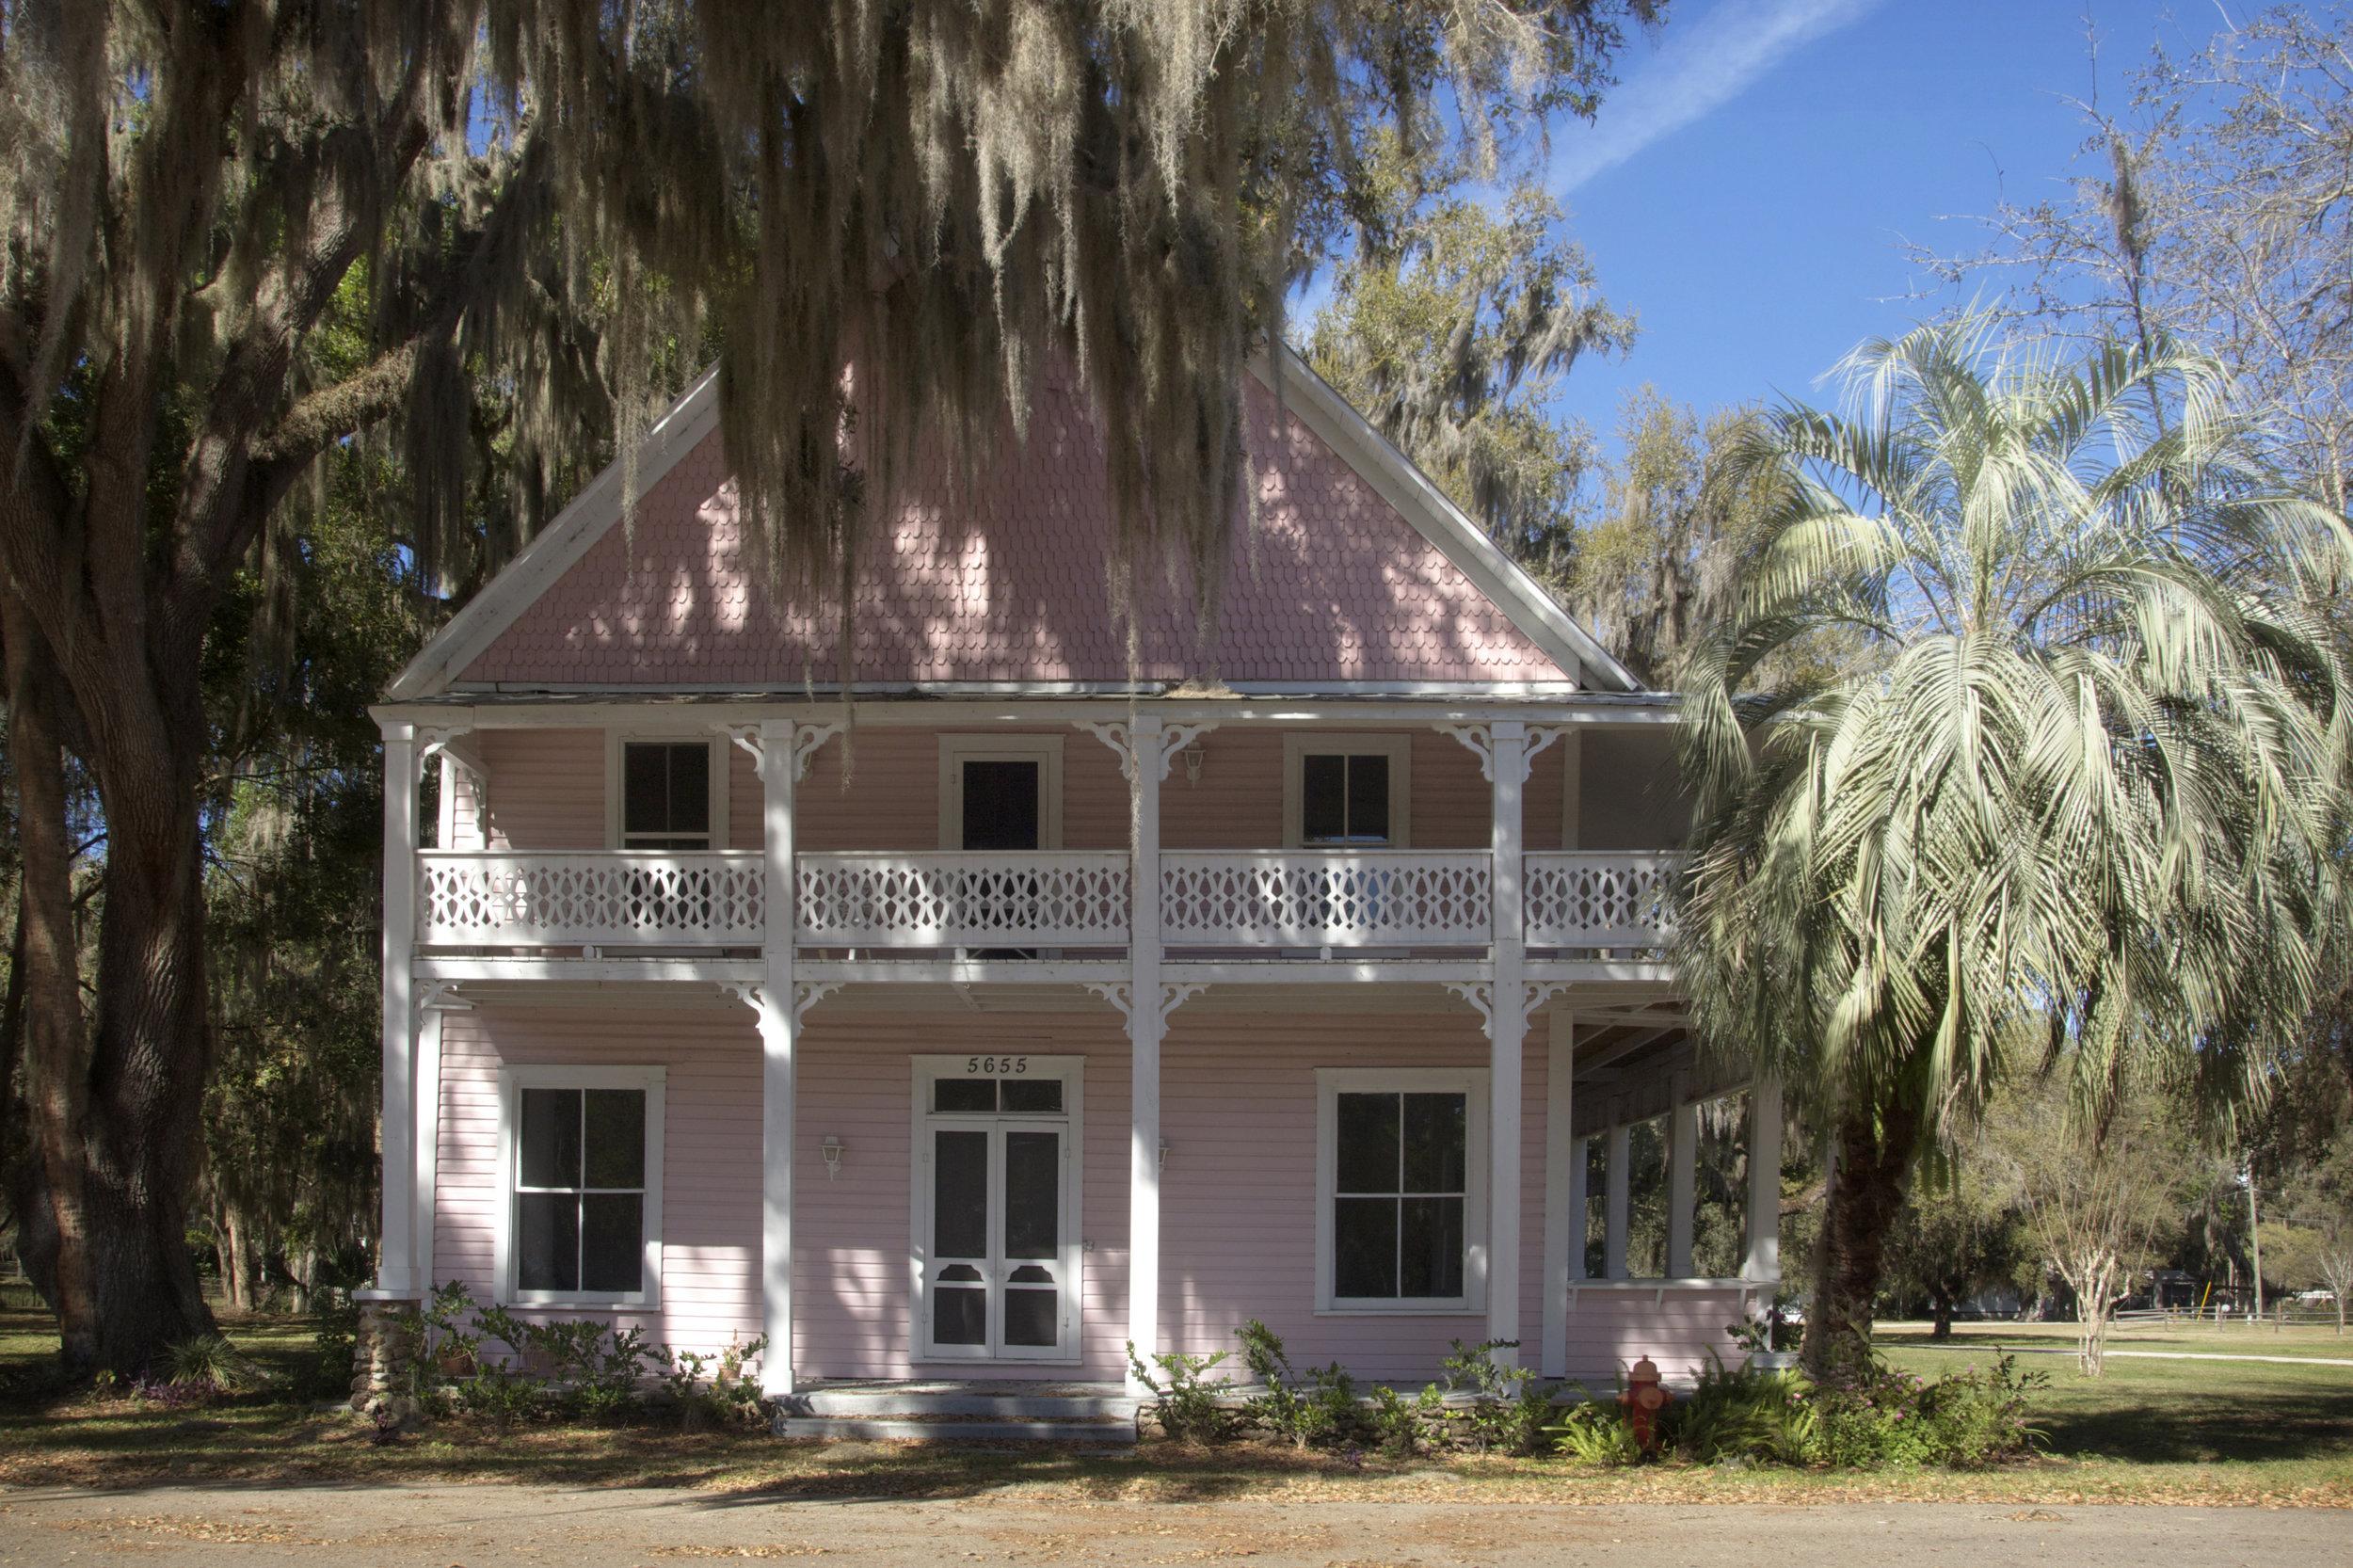 mcintosh florida marion county pink abandoned hotel railroad